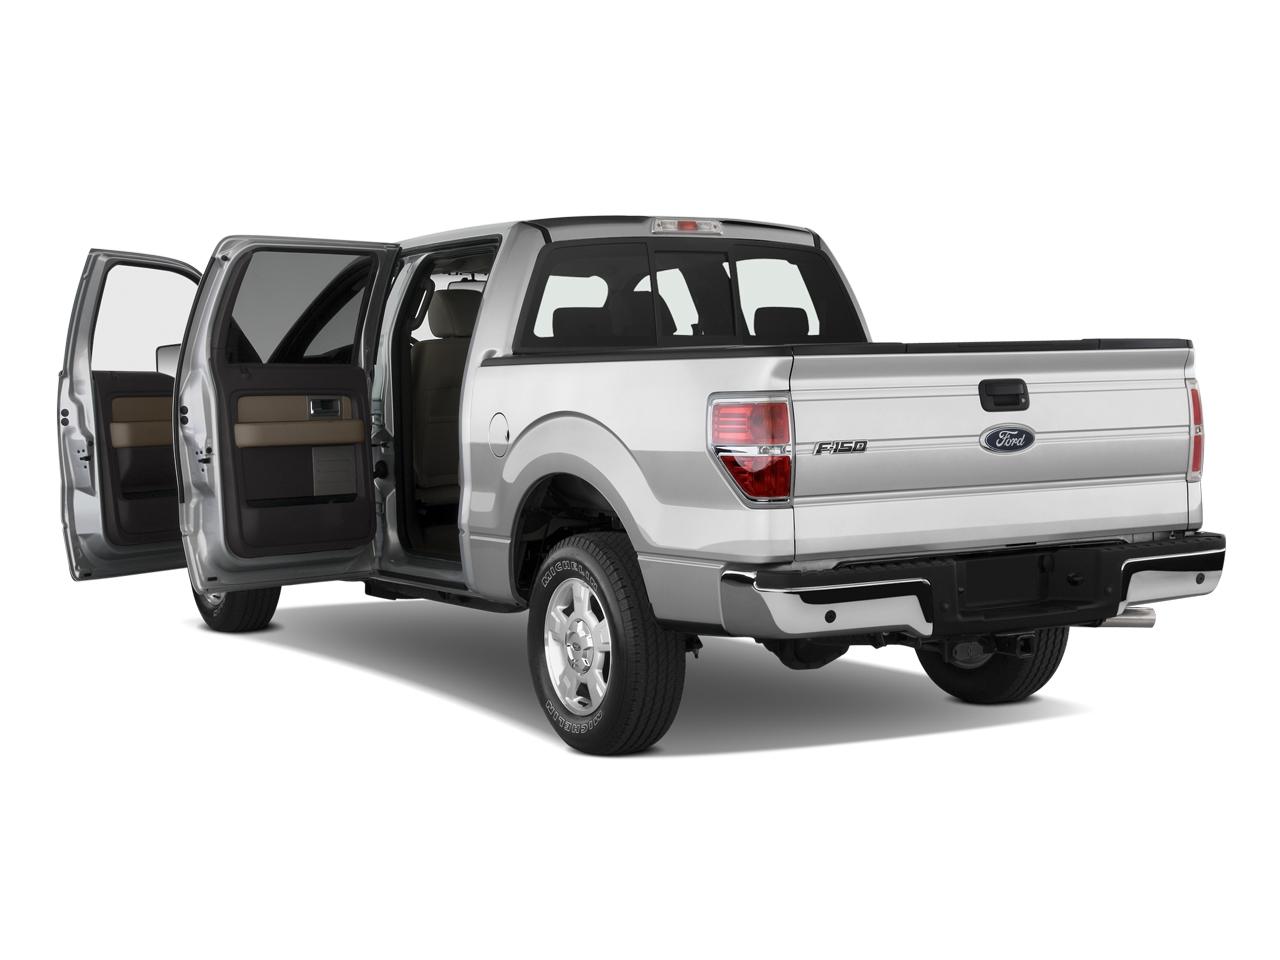 2009 ford f 150 platinum lariat 4x4 ford fullsize pickup truck review automobile magazine. Black Bedroom Furniture Sets. Home Design Ideas